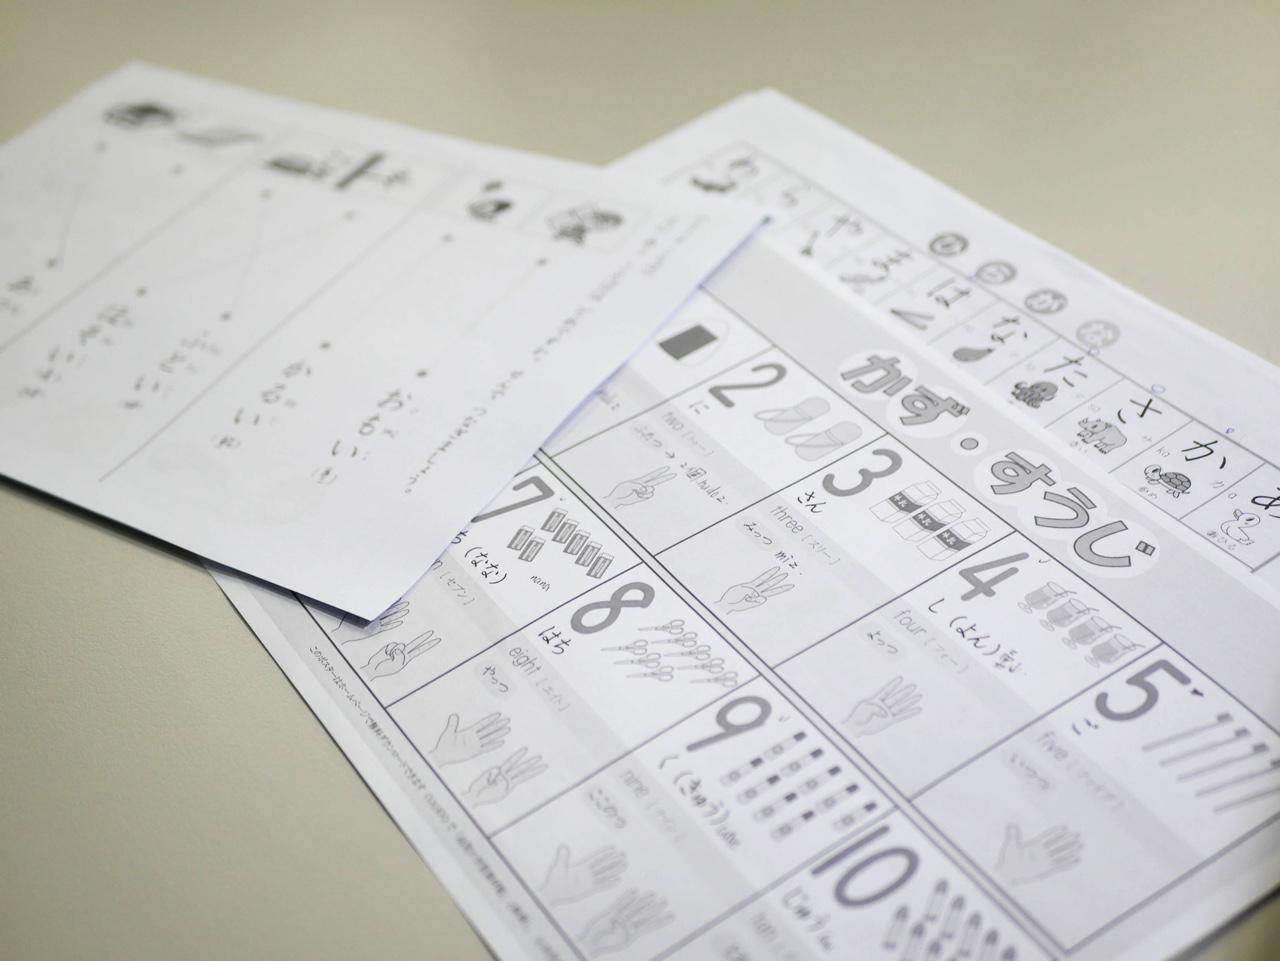 KKday社内で開かれた日本語教室の教材